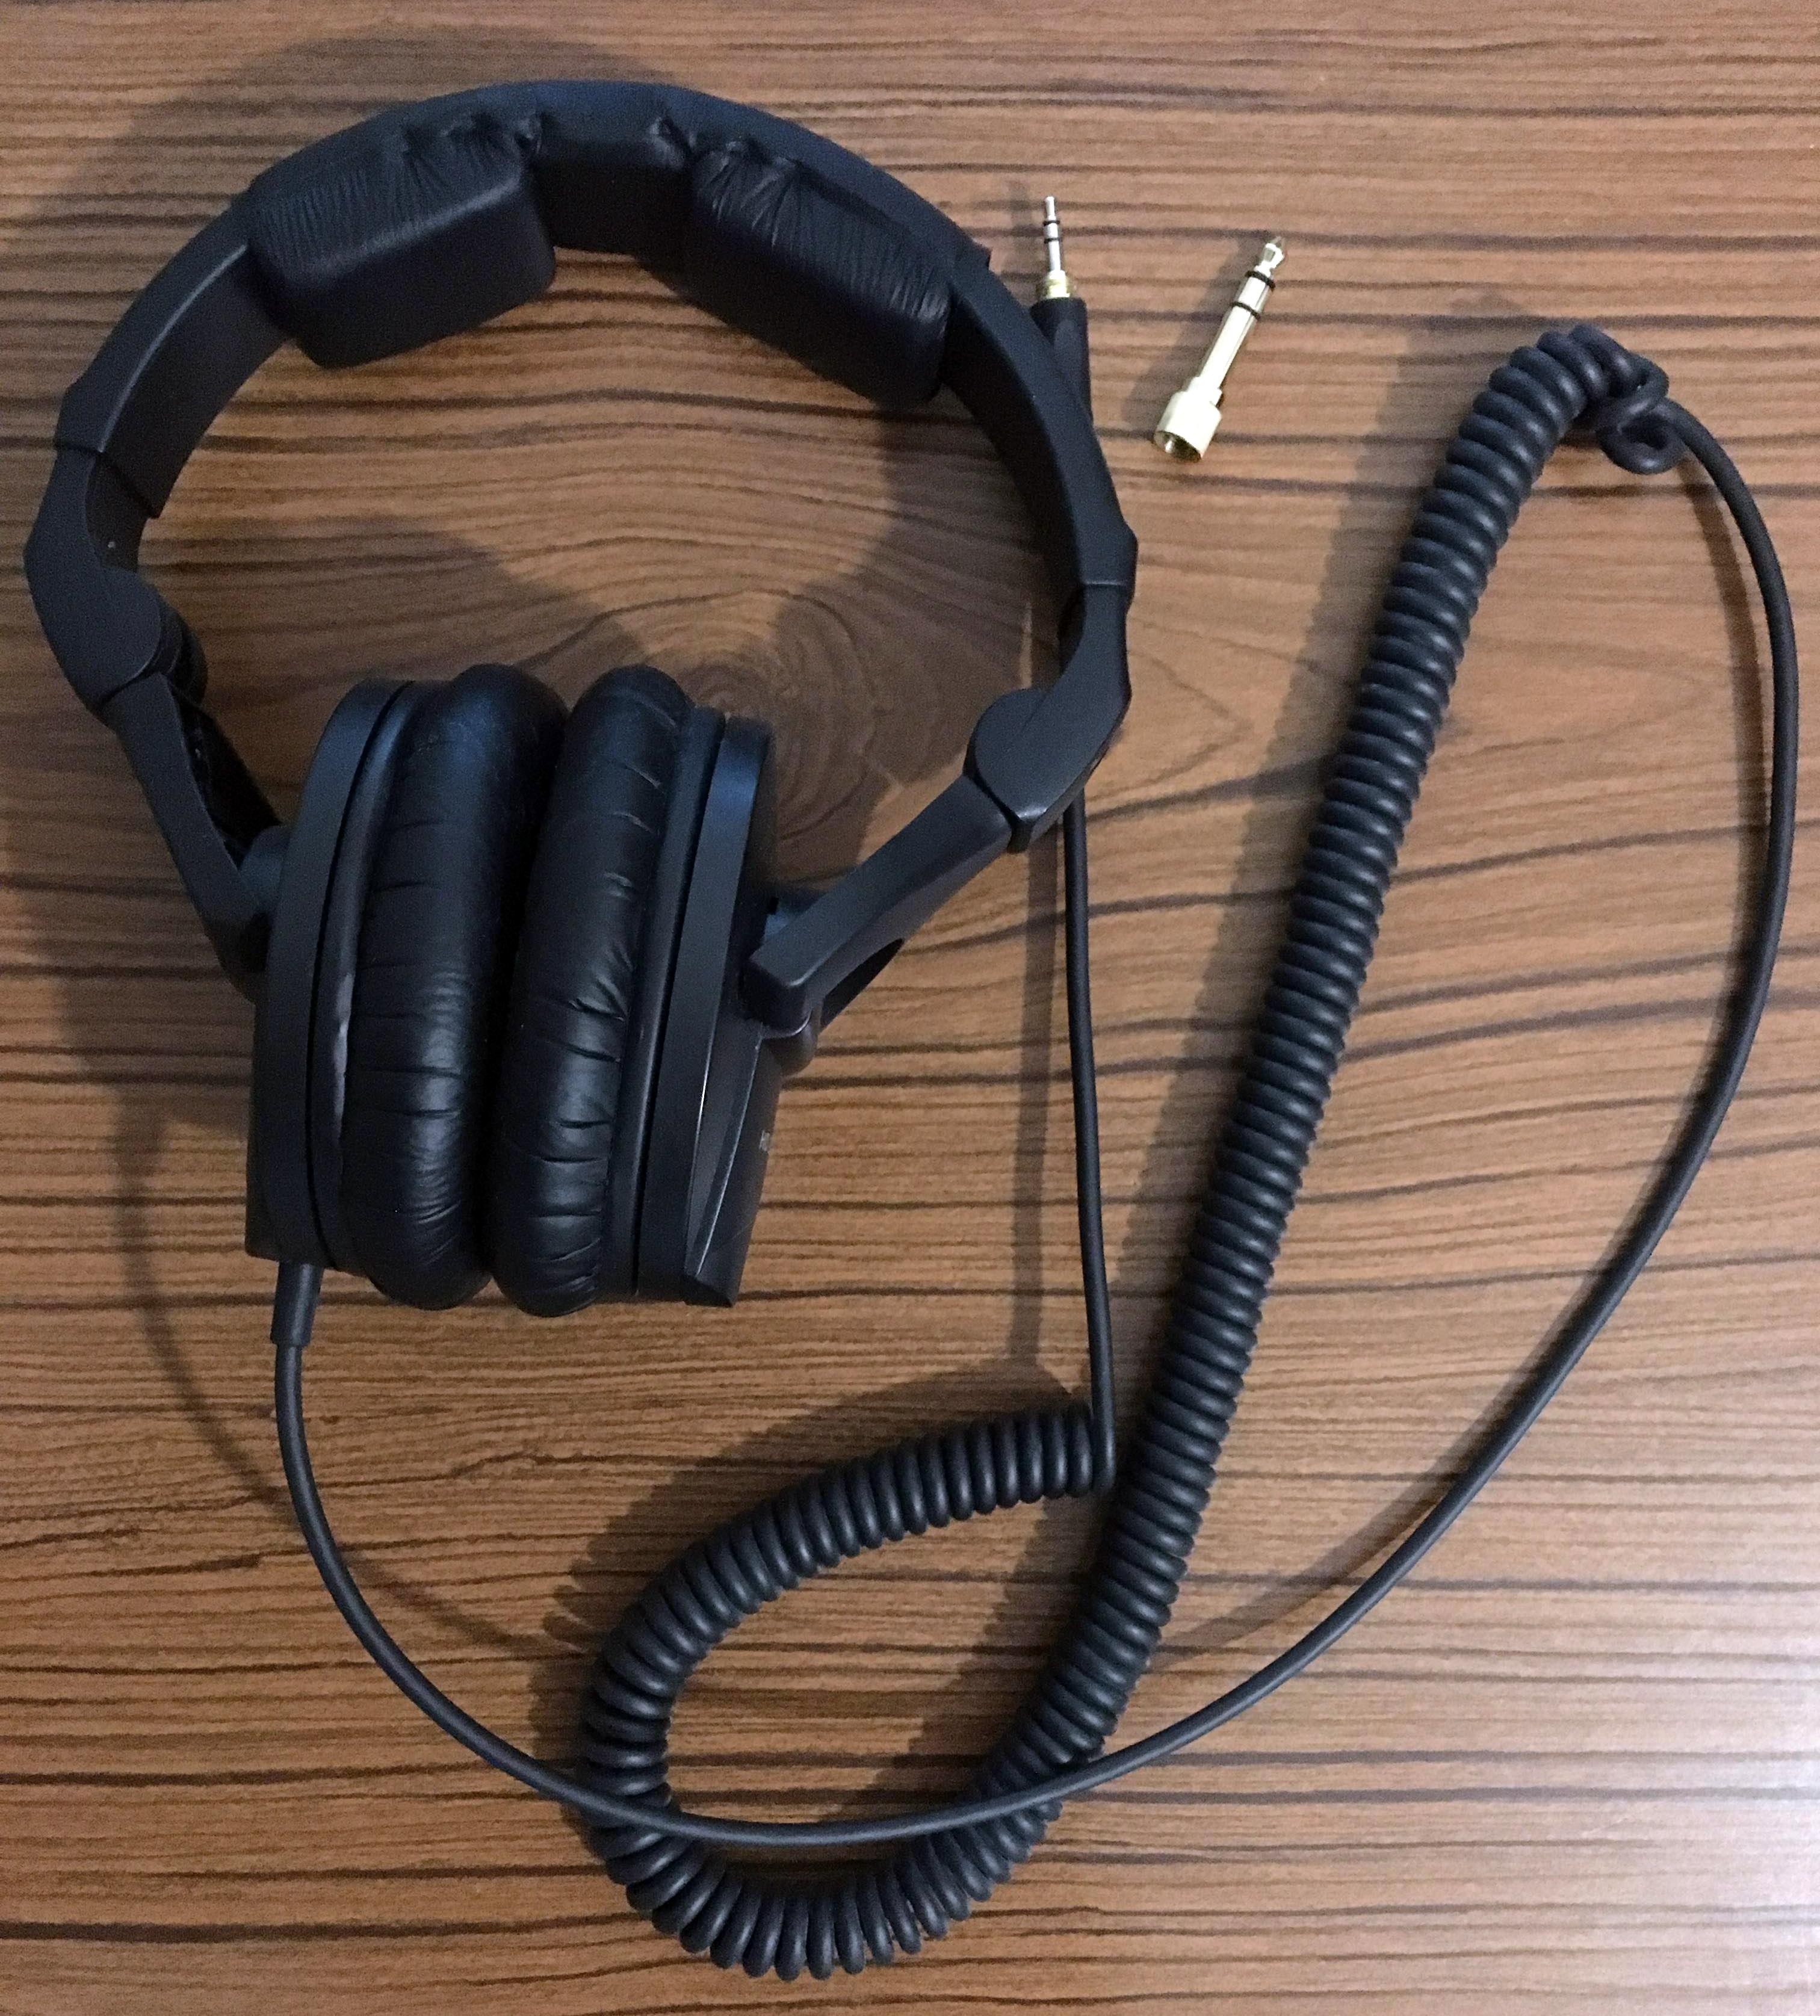 Sennheiser Hd 280 Pro цена